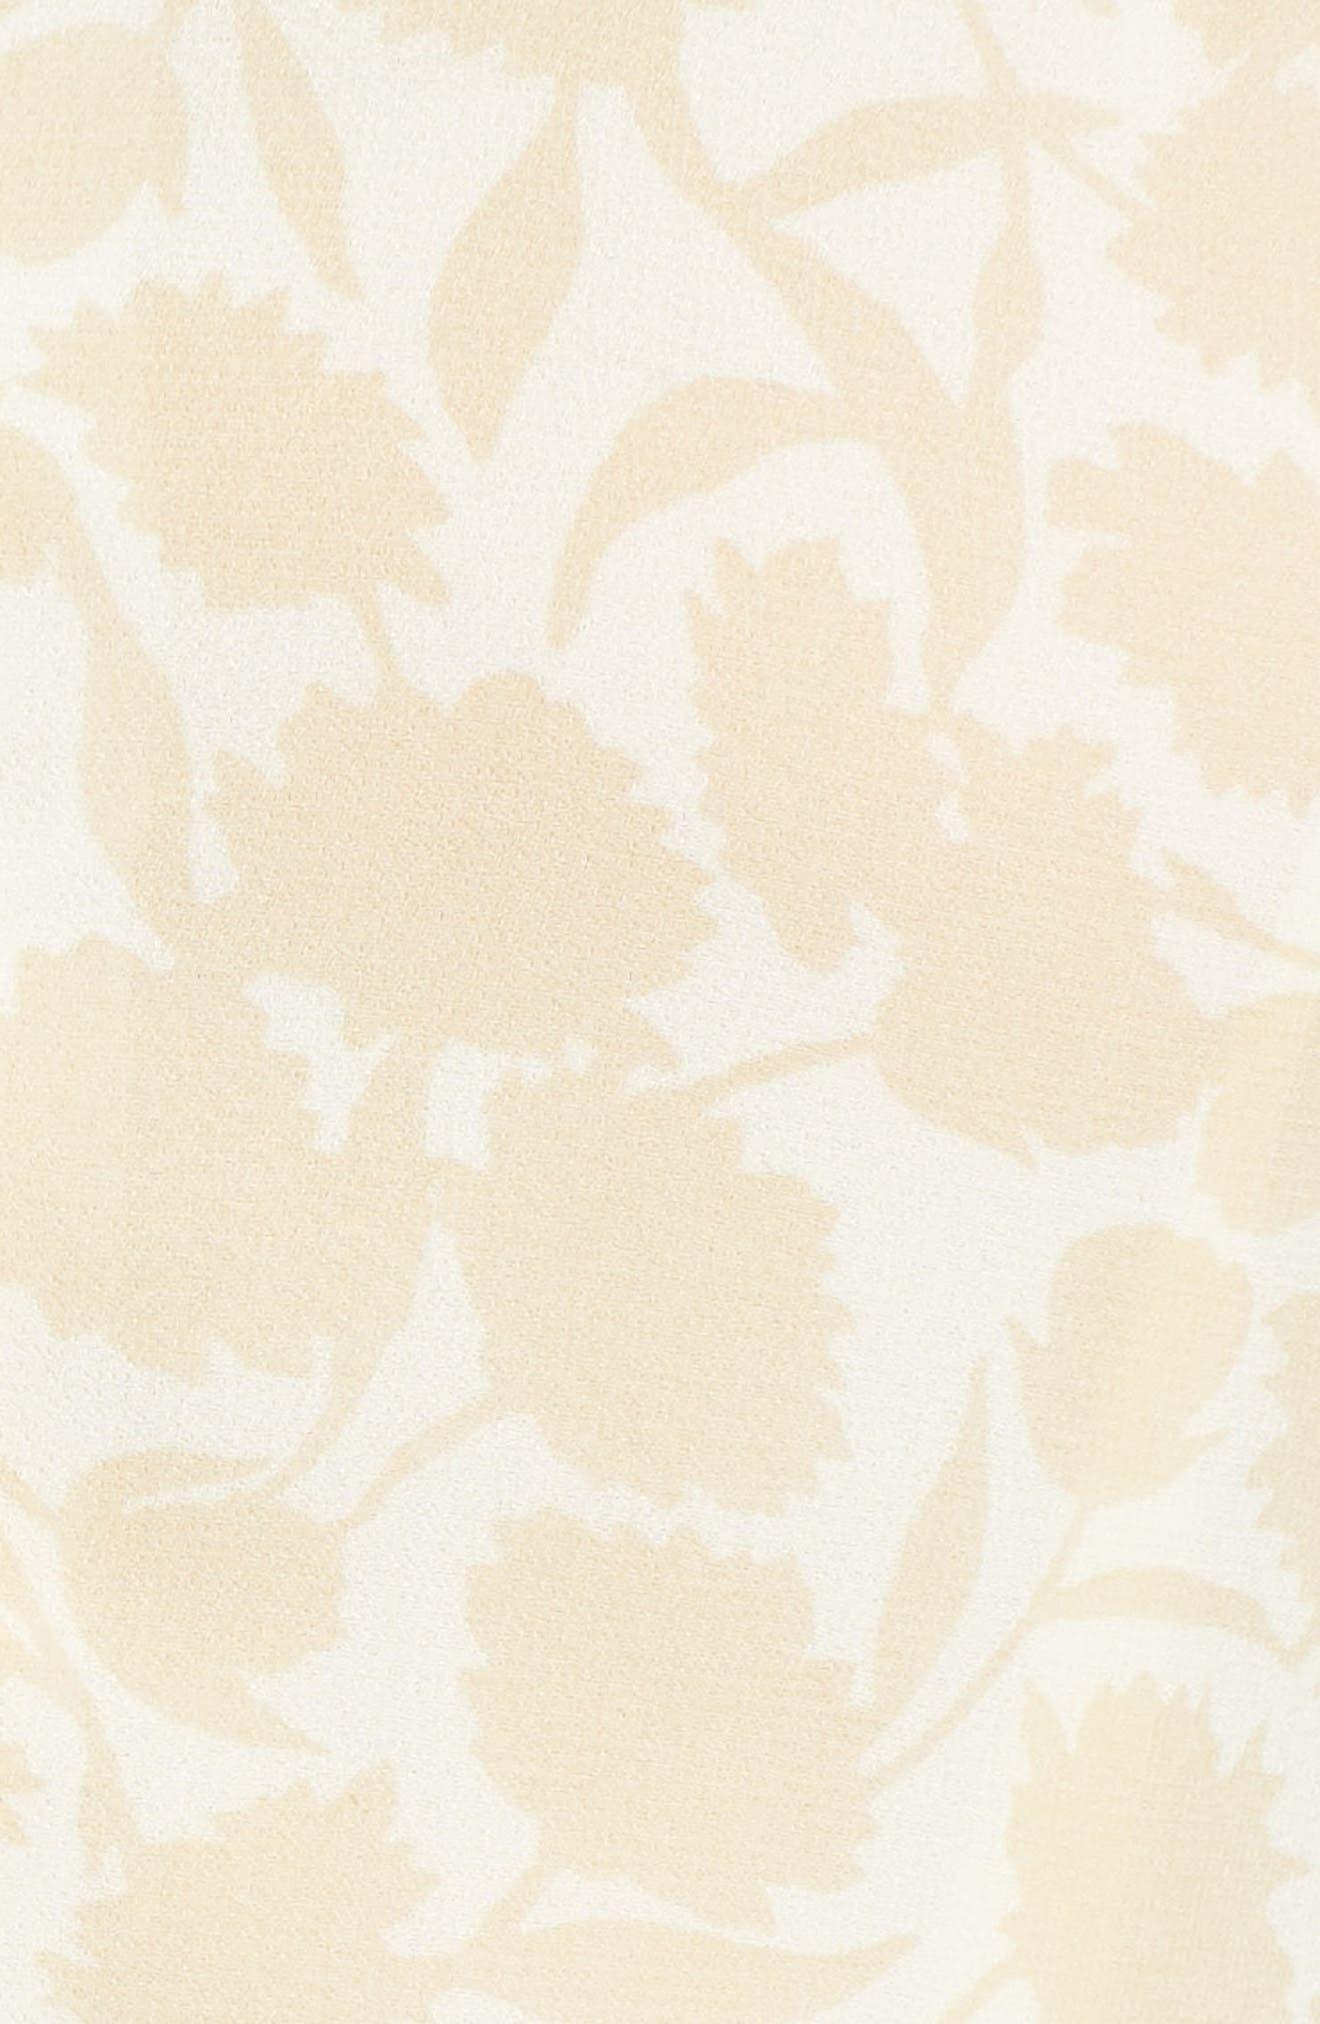 Esther Shadow Branch Chiffon Dress,                             Alternate thumbnail 7, color,                             Cream Combo